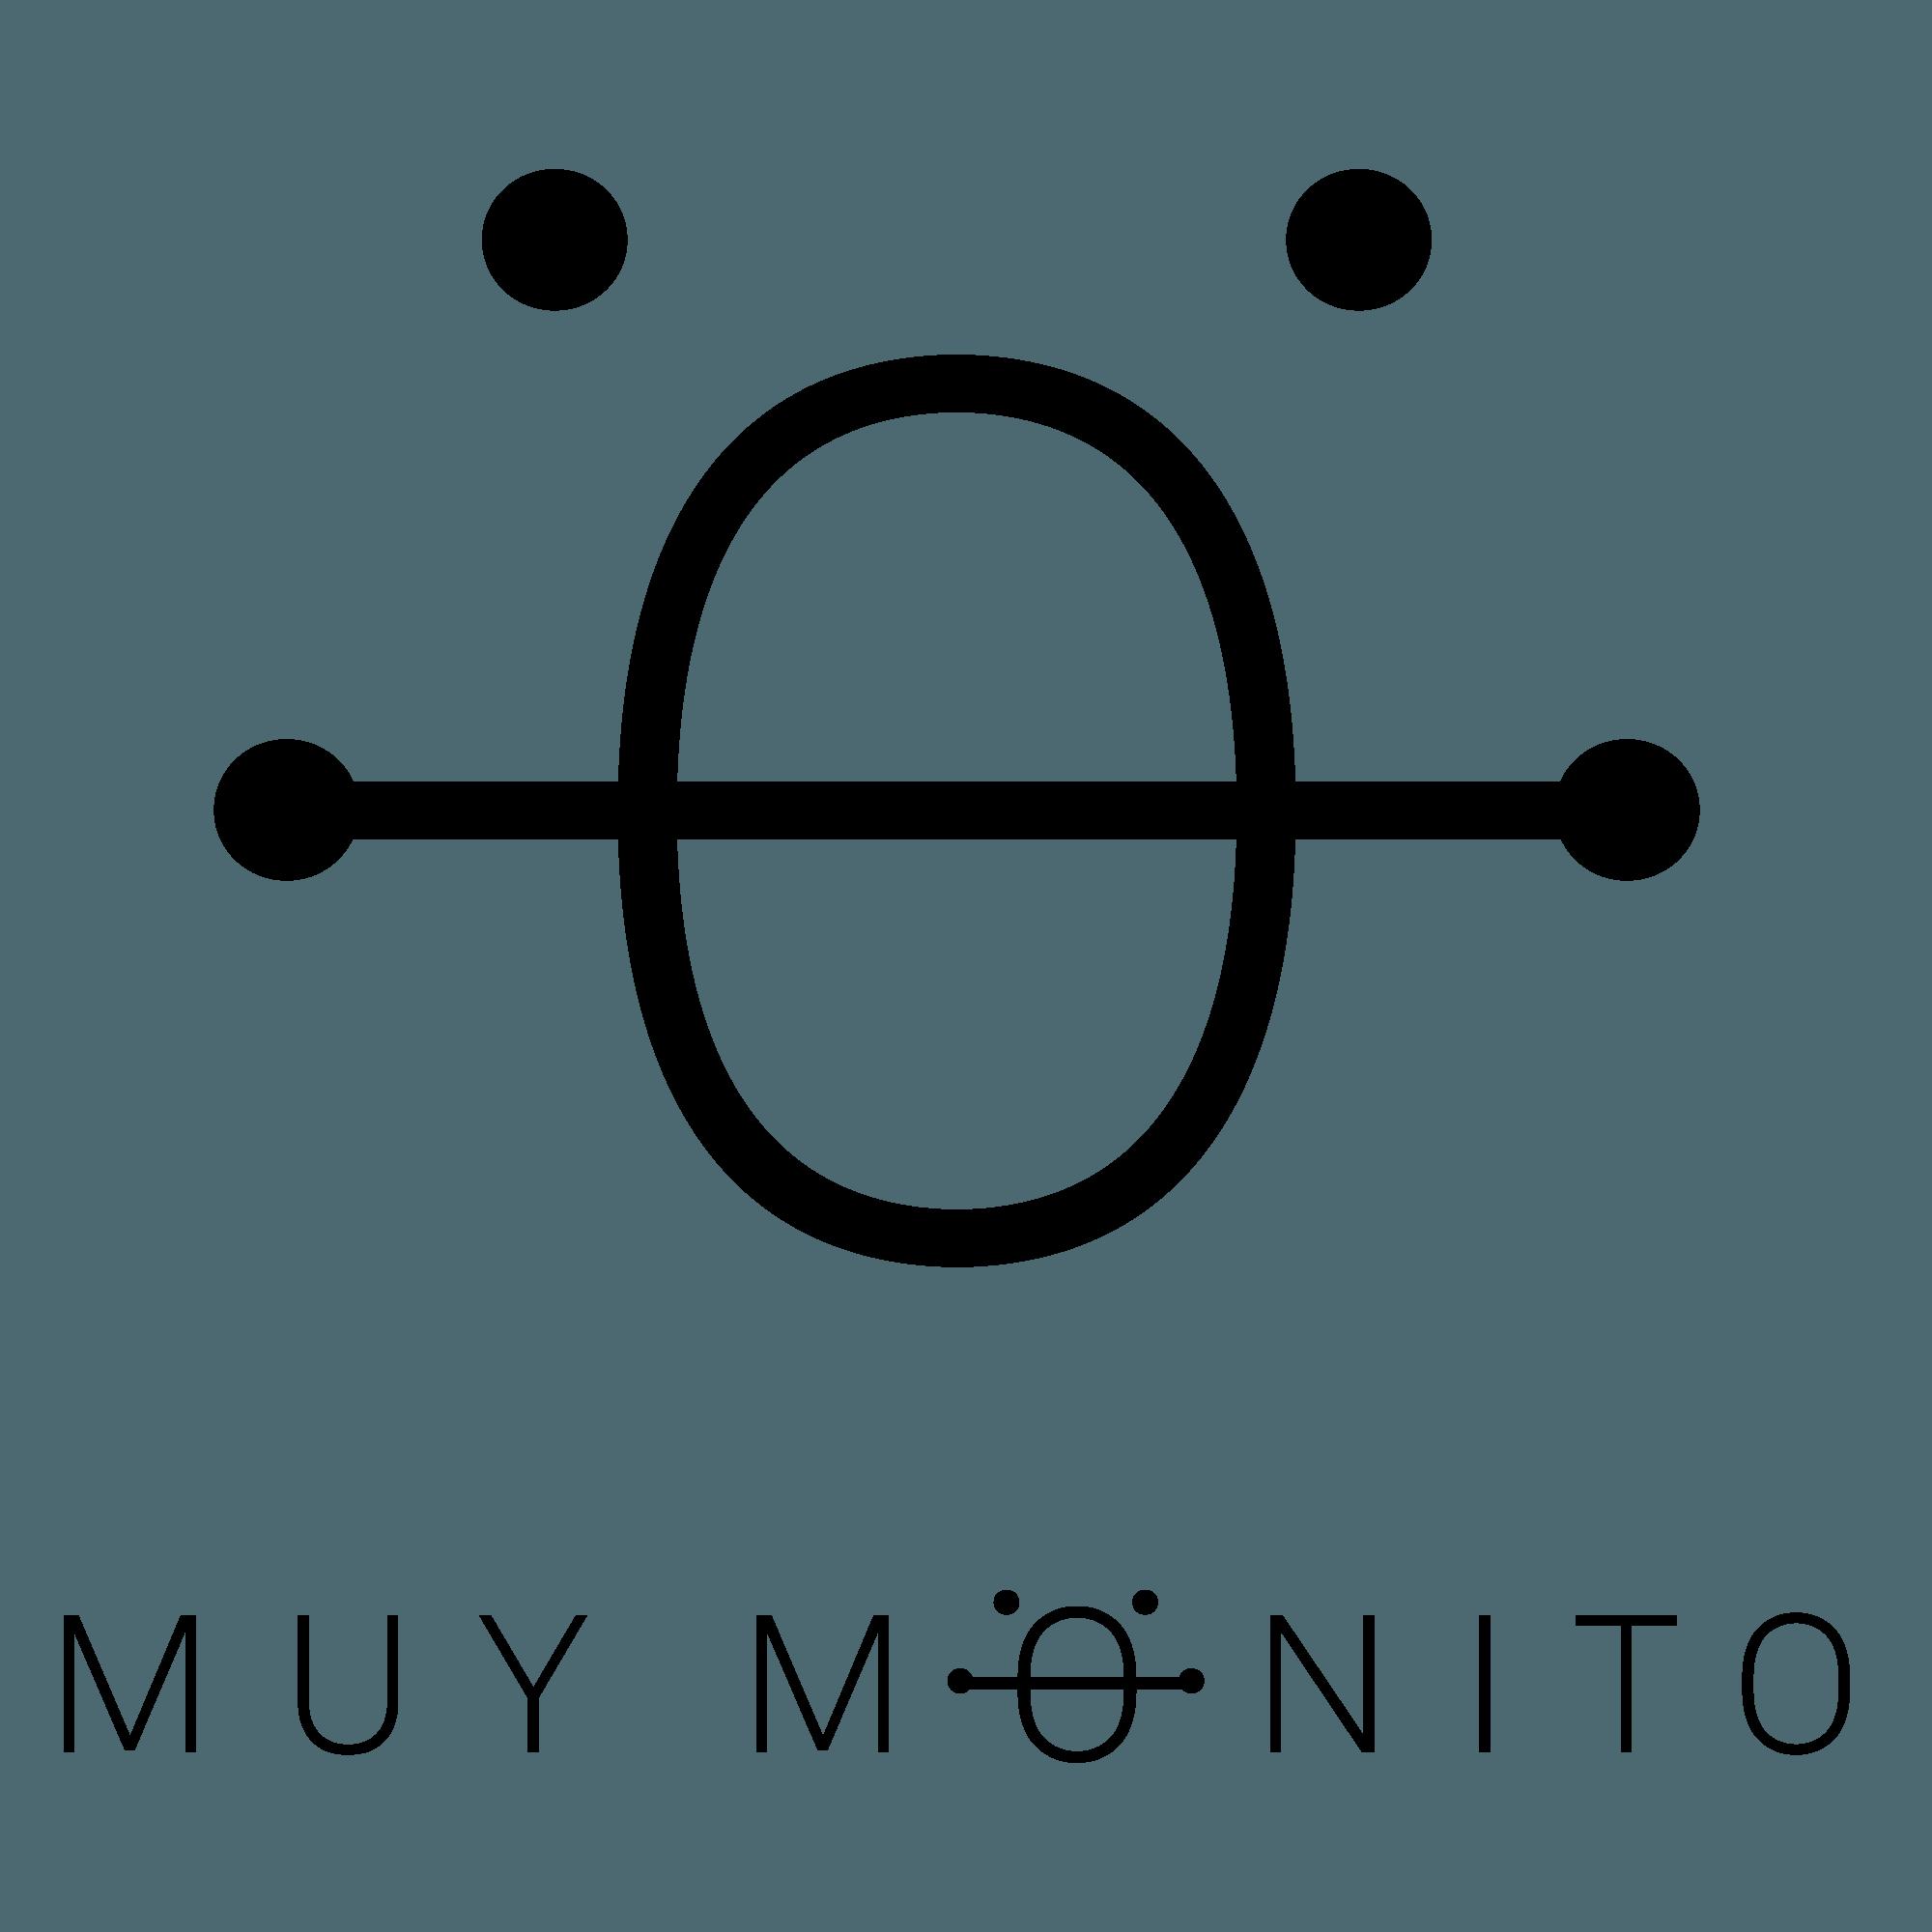 Muy Monito Logo